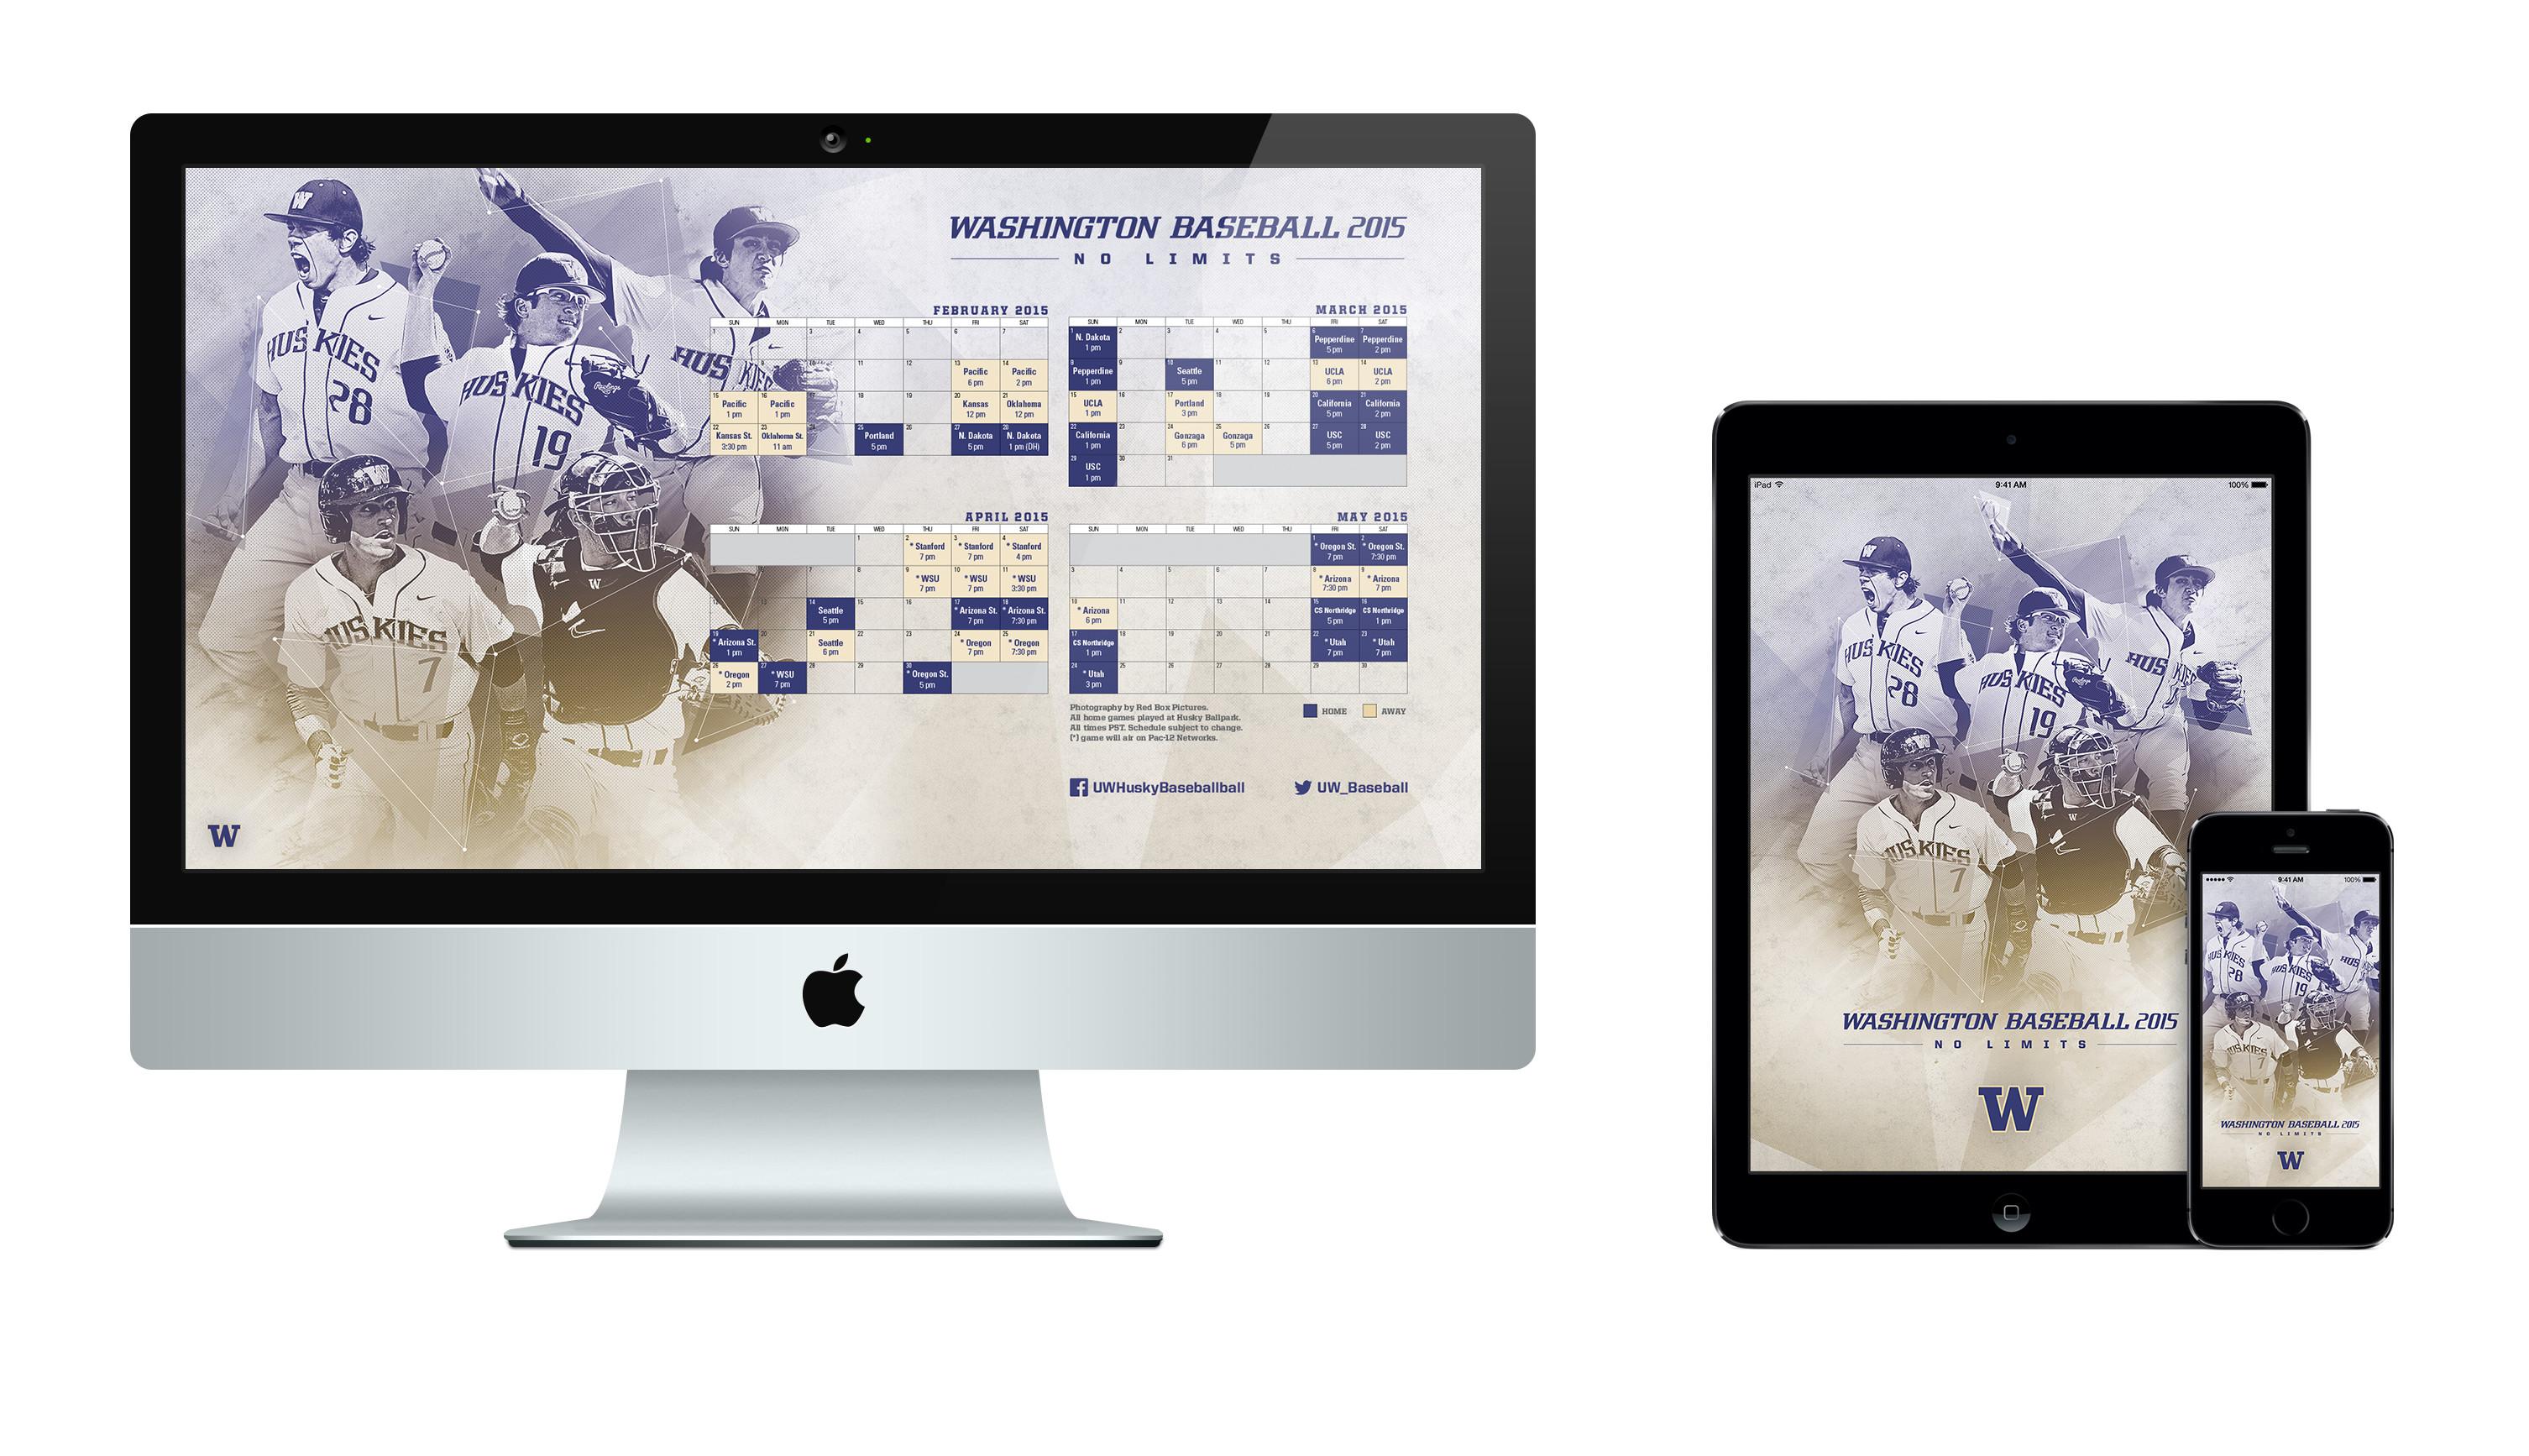 UW All Sports Wallpapers. Washington Huskies Wallpapers